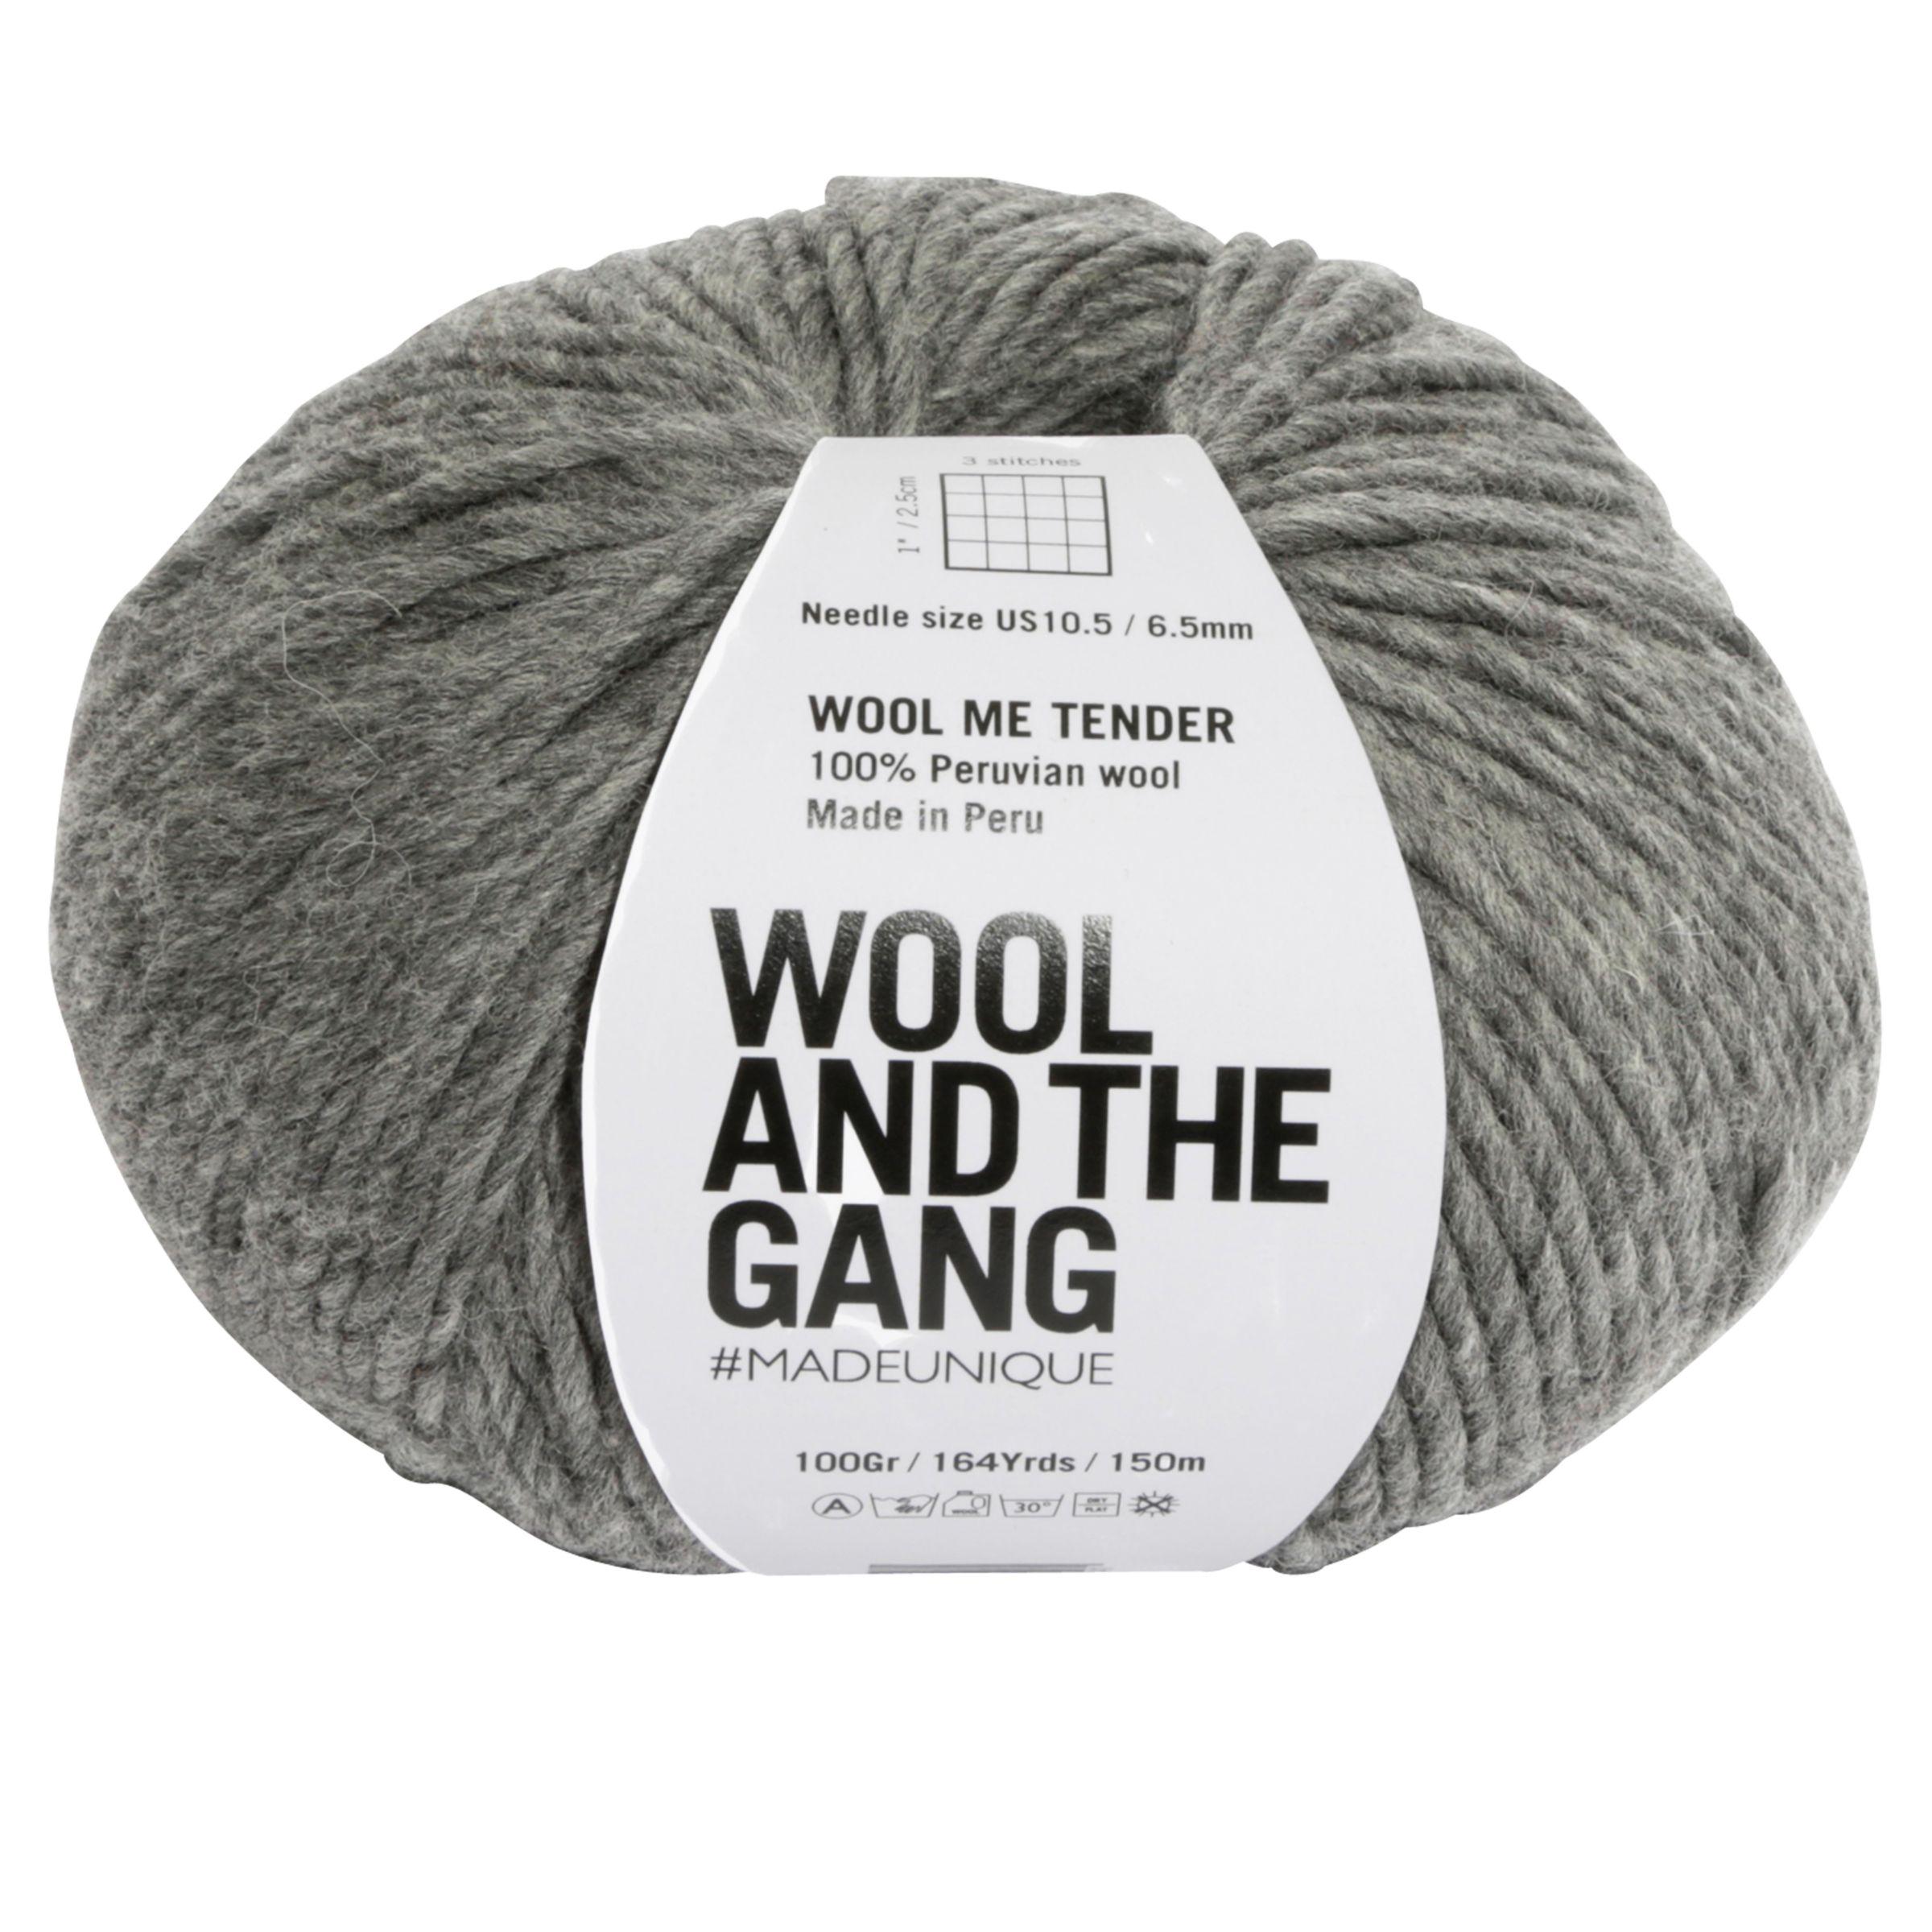 Wool and the Gang Wool and the Gang Wool Me Tender Chunky Yarn, 100g